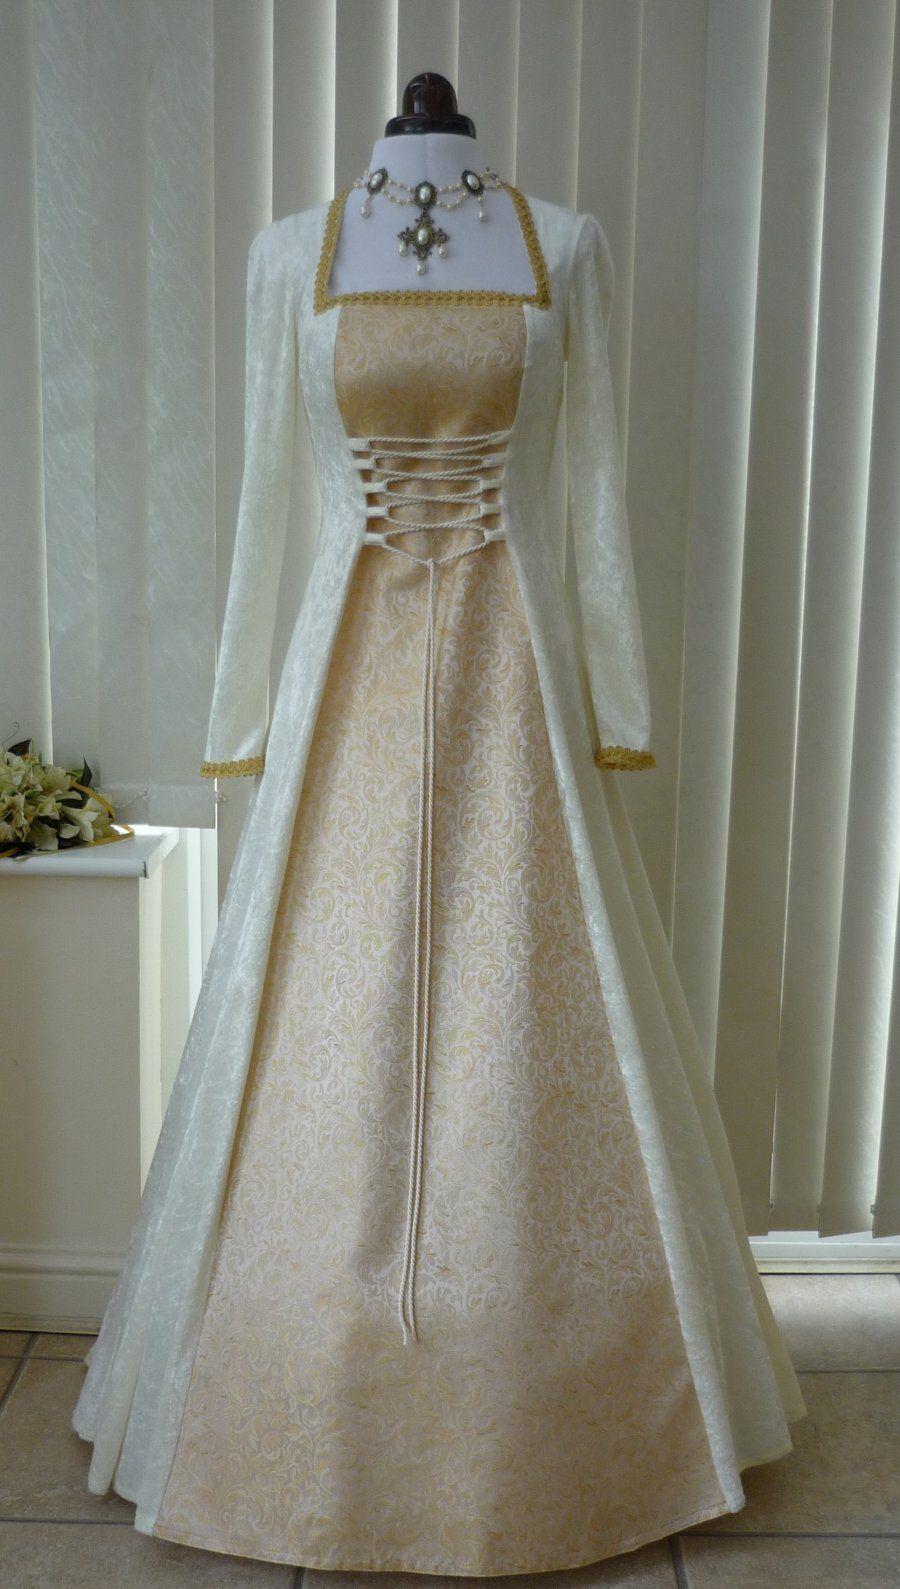 Medieval Pagan Cream & Gold Brocade wedding dress | different ...